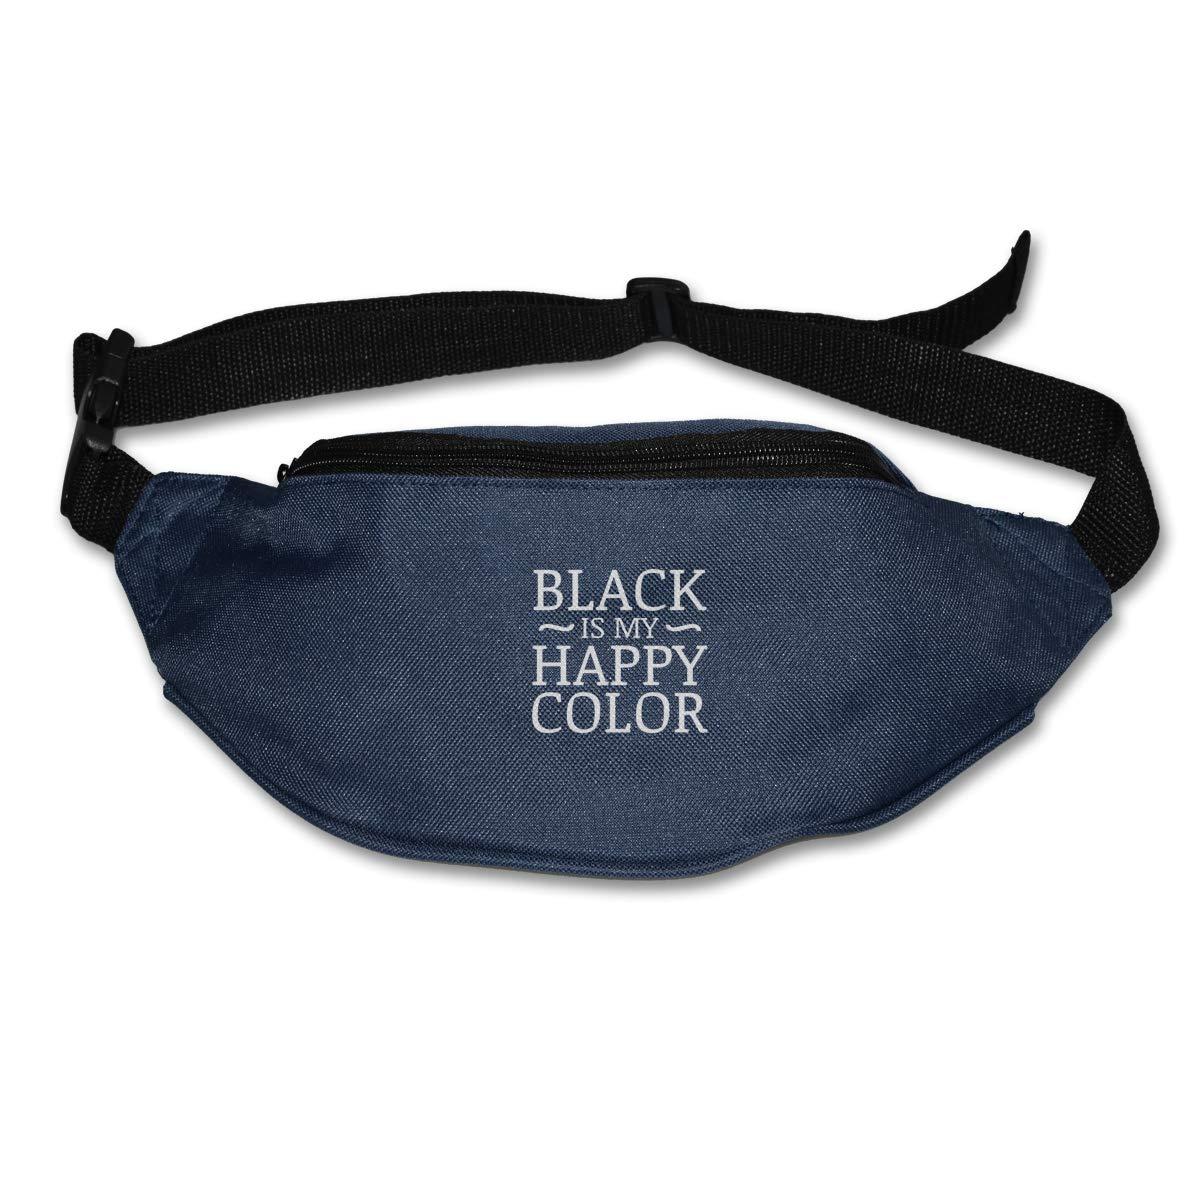 Black Is My Happy Color Sport Waist Bag Fanny Pack Adjustable For Hike